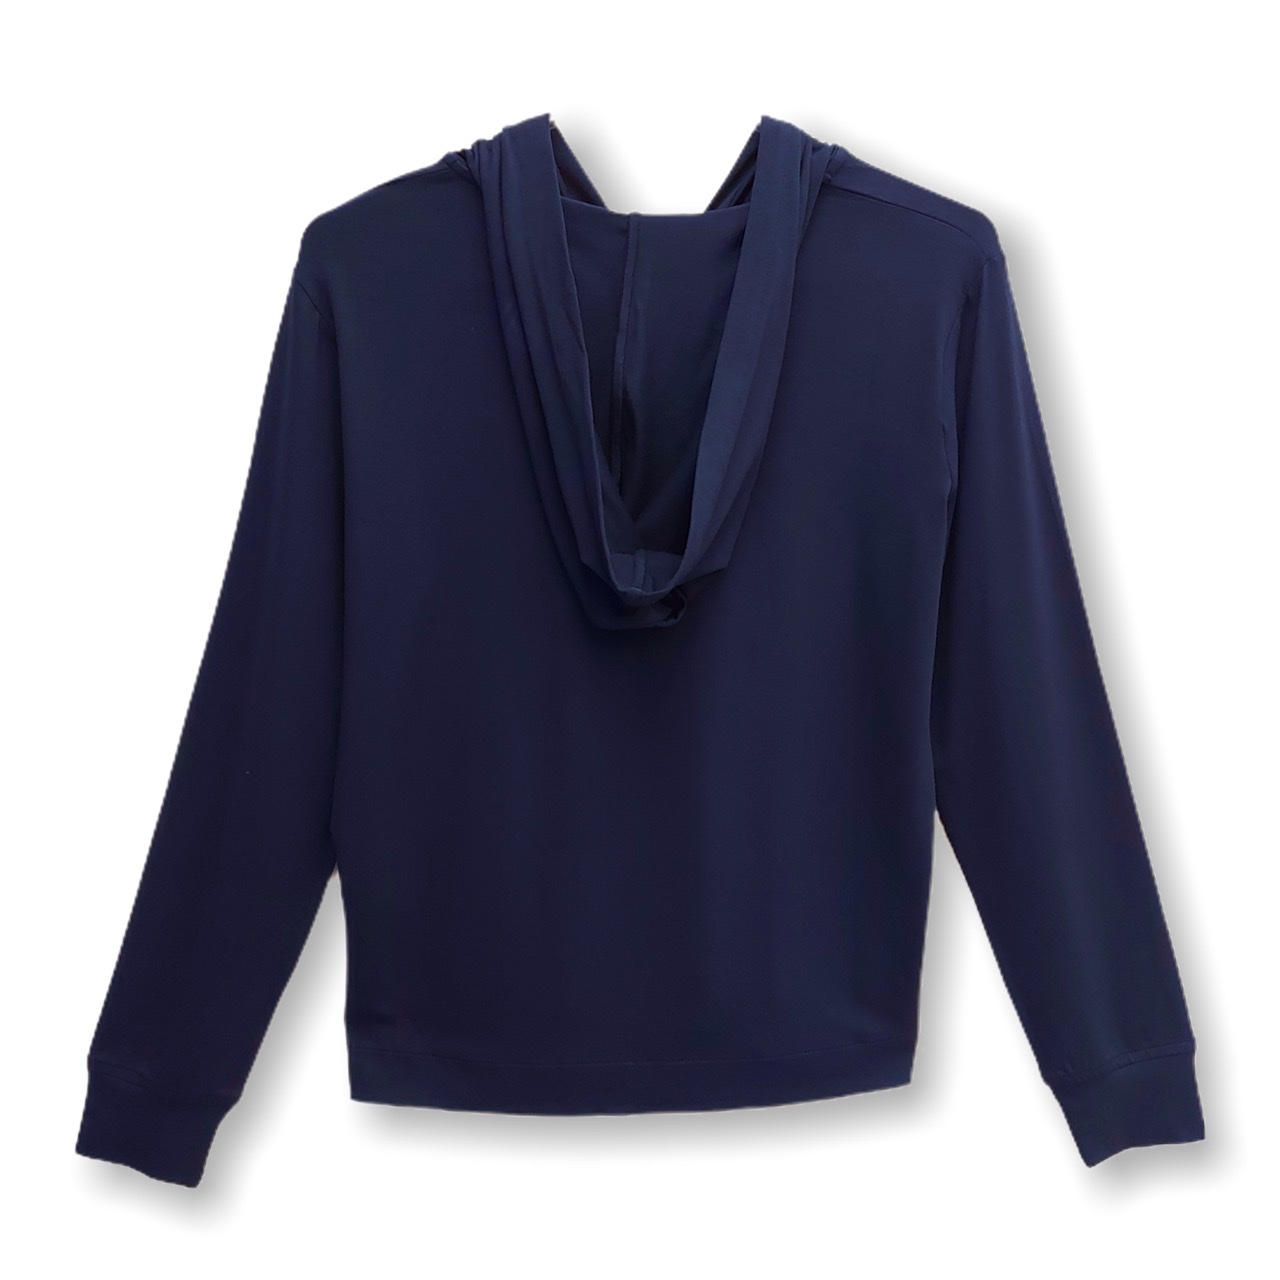 Blusa Giovana azul marinho  - Vivian Bógus